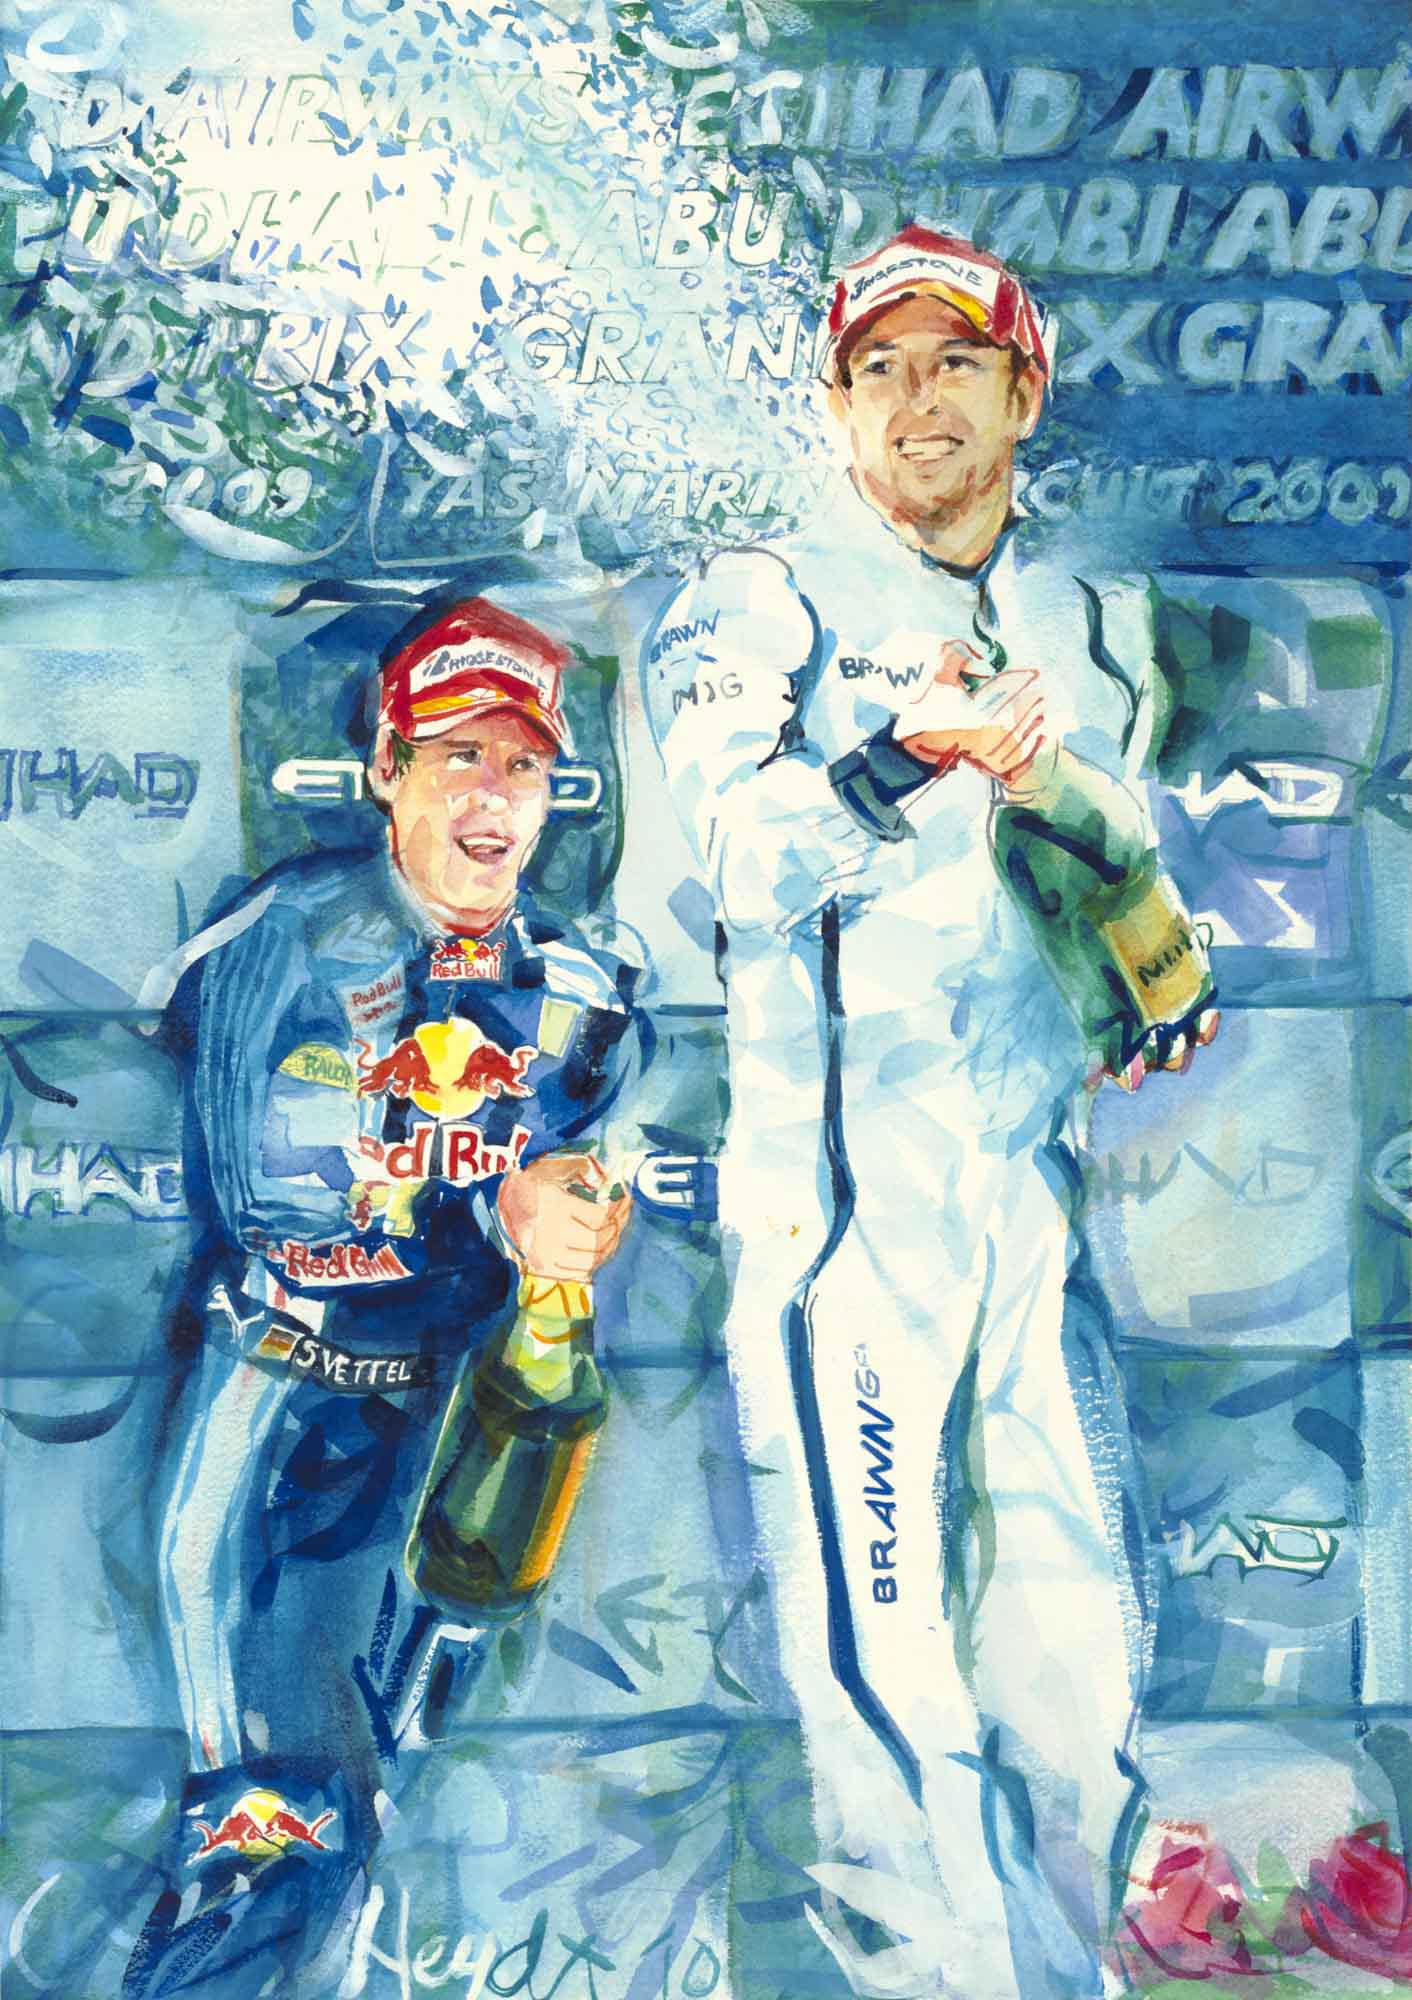 Formula1-wHEYDT-winners circle celebration.jpg